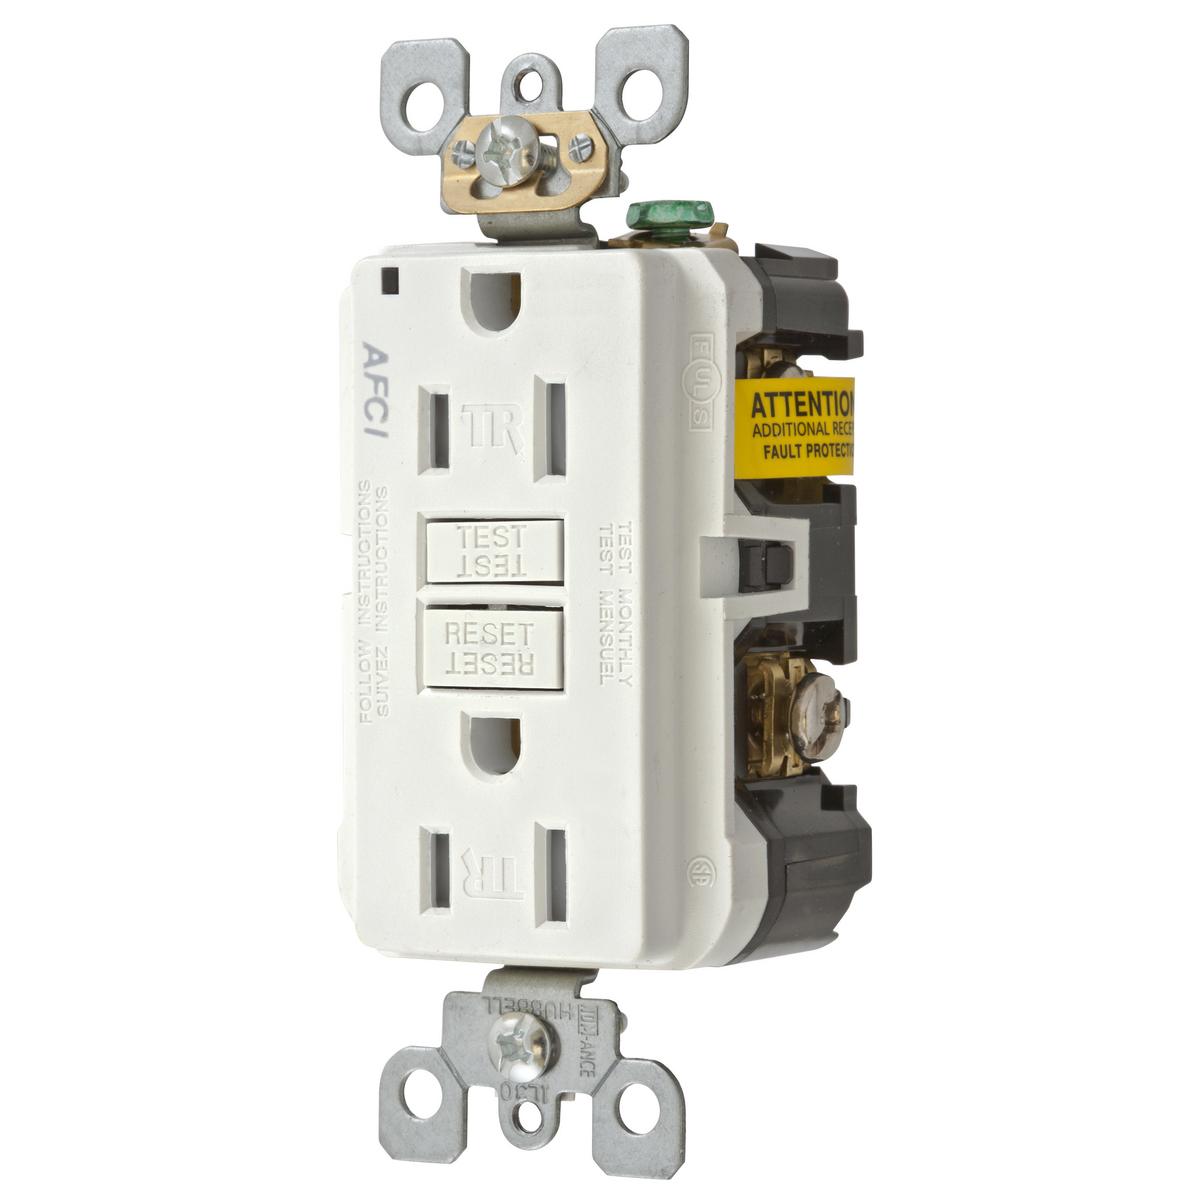 Wiring Device-KellemsAFR15TRW